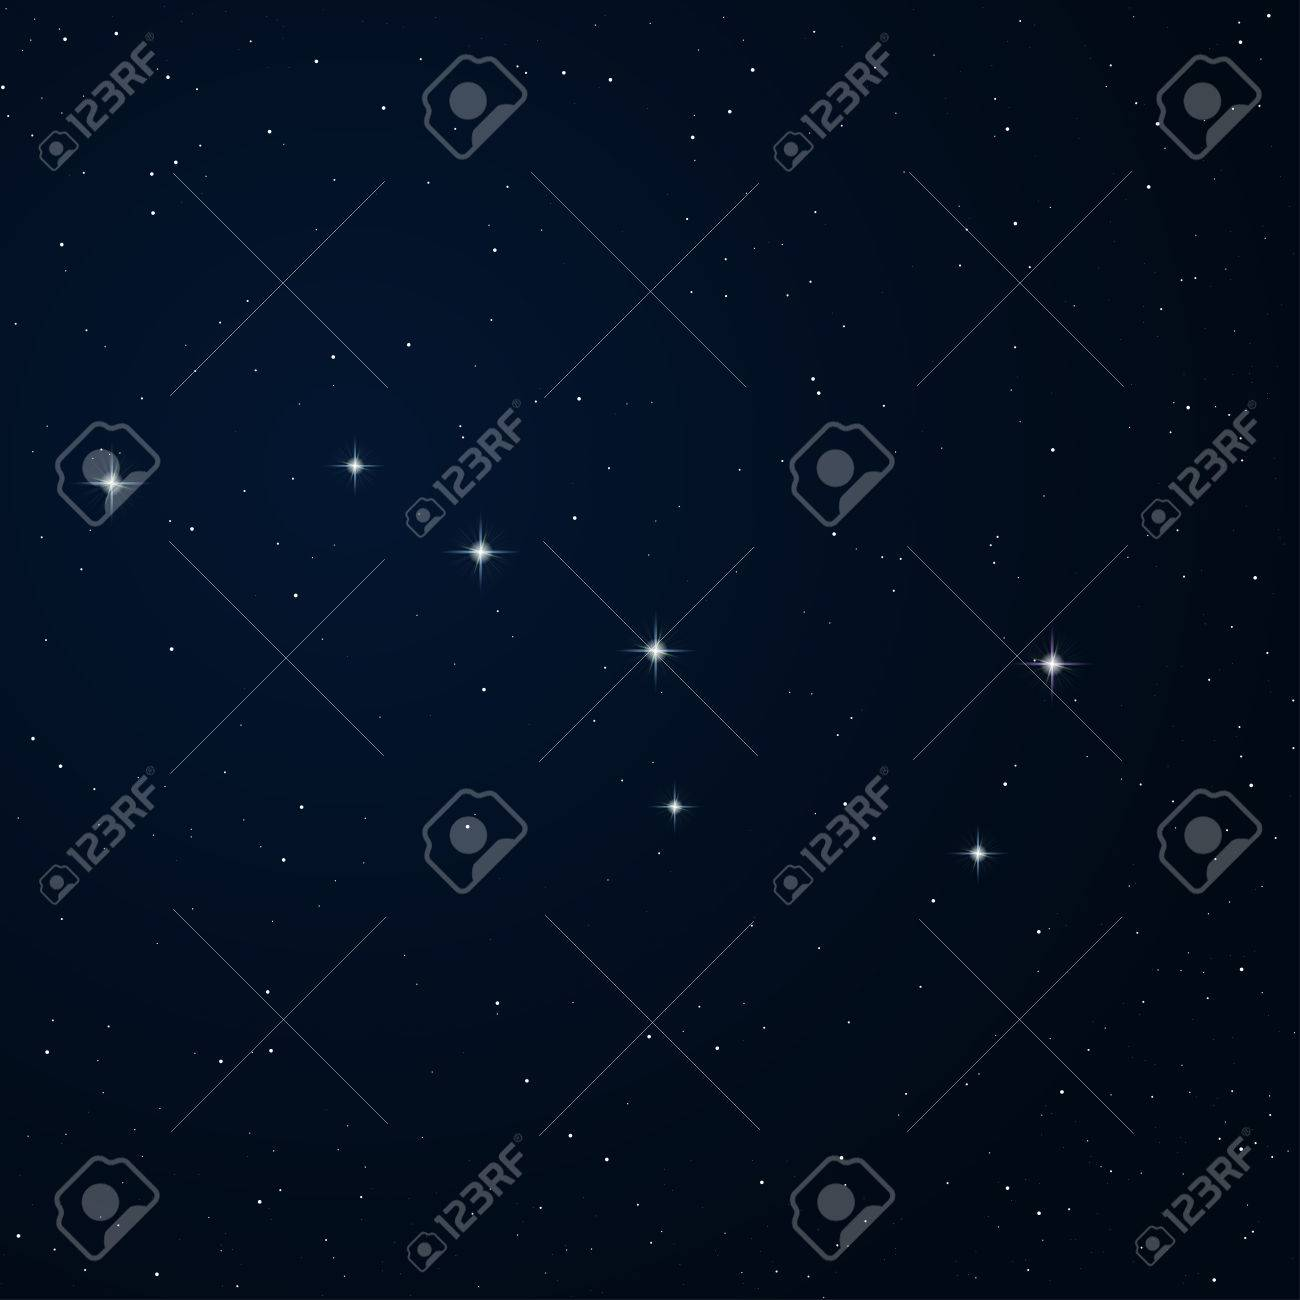 Realistic vector image of constellation Ursa major on the night sky. - 36570598